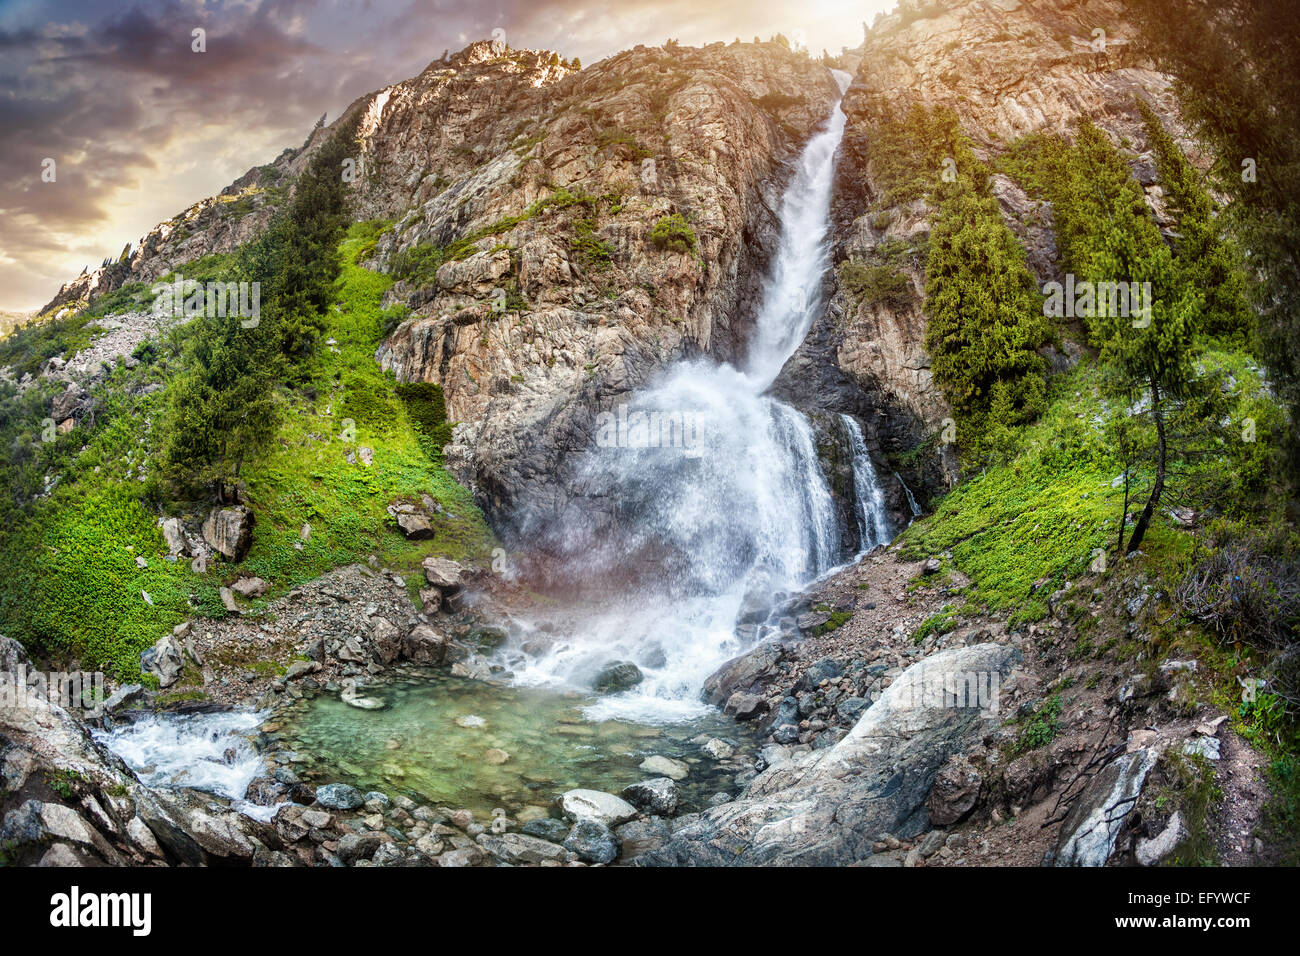 Burhan Bulak Mountain waterfall in Alatau Dzungarian, du Kazakhstan, de l'Asie centrale Photo Stock